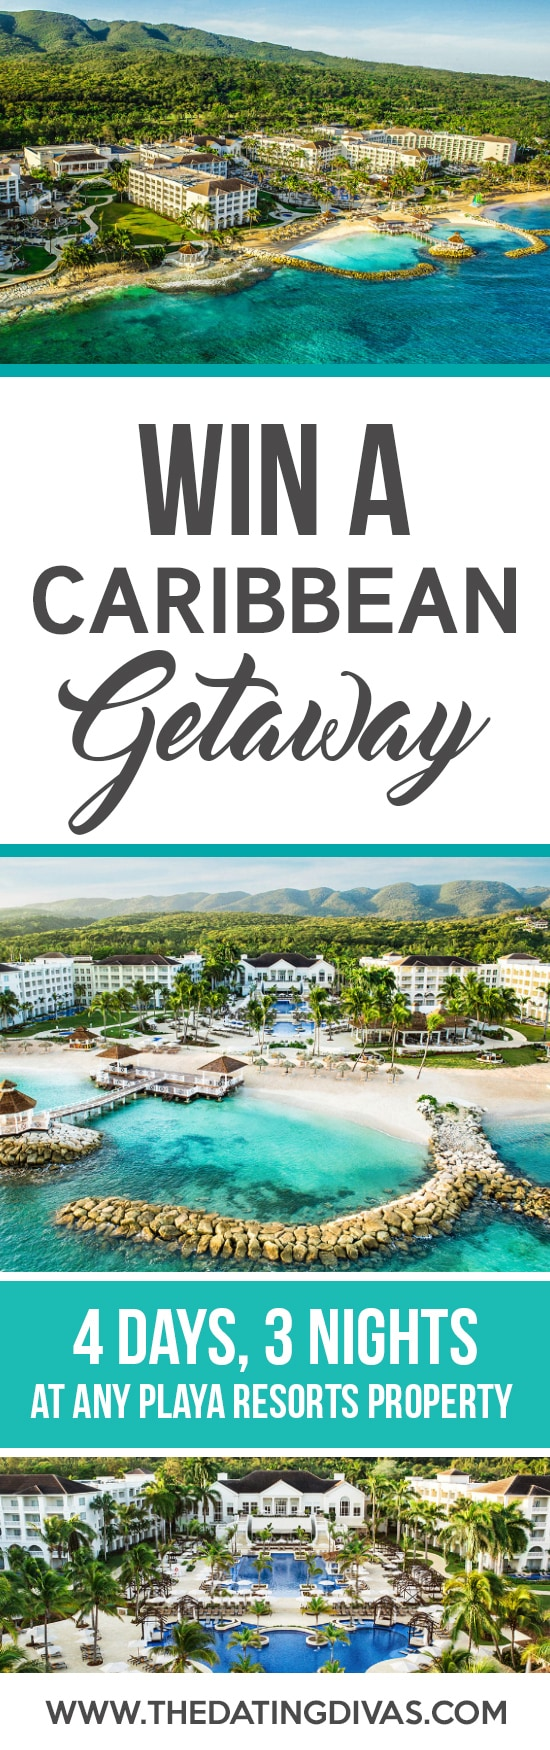 WIN a Caribbean Getaway!